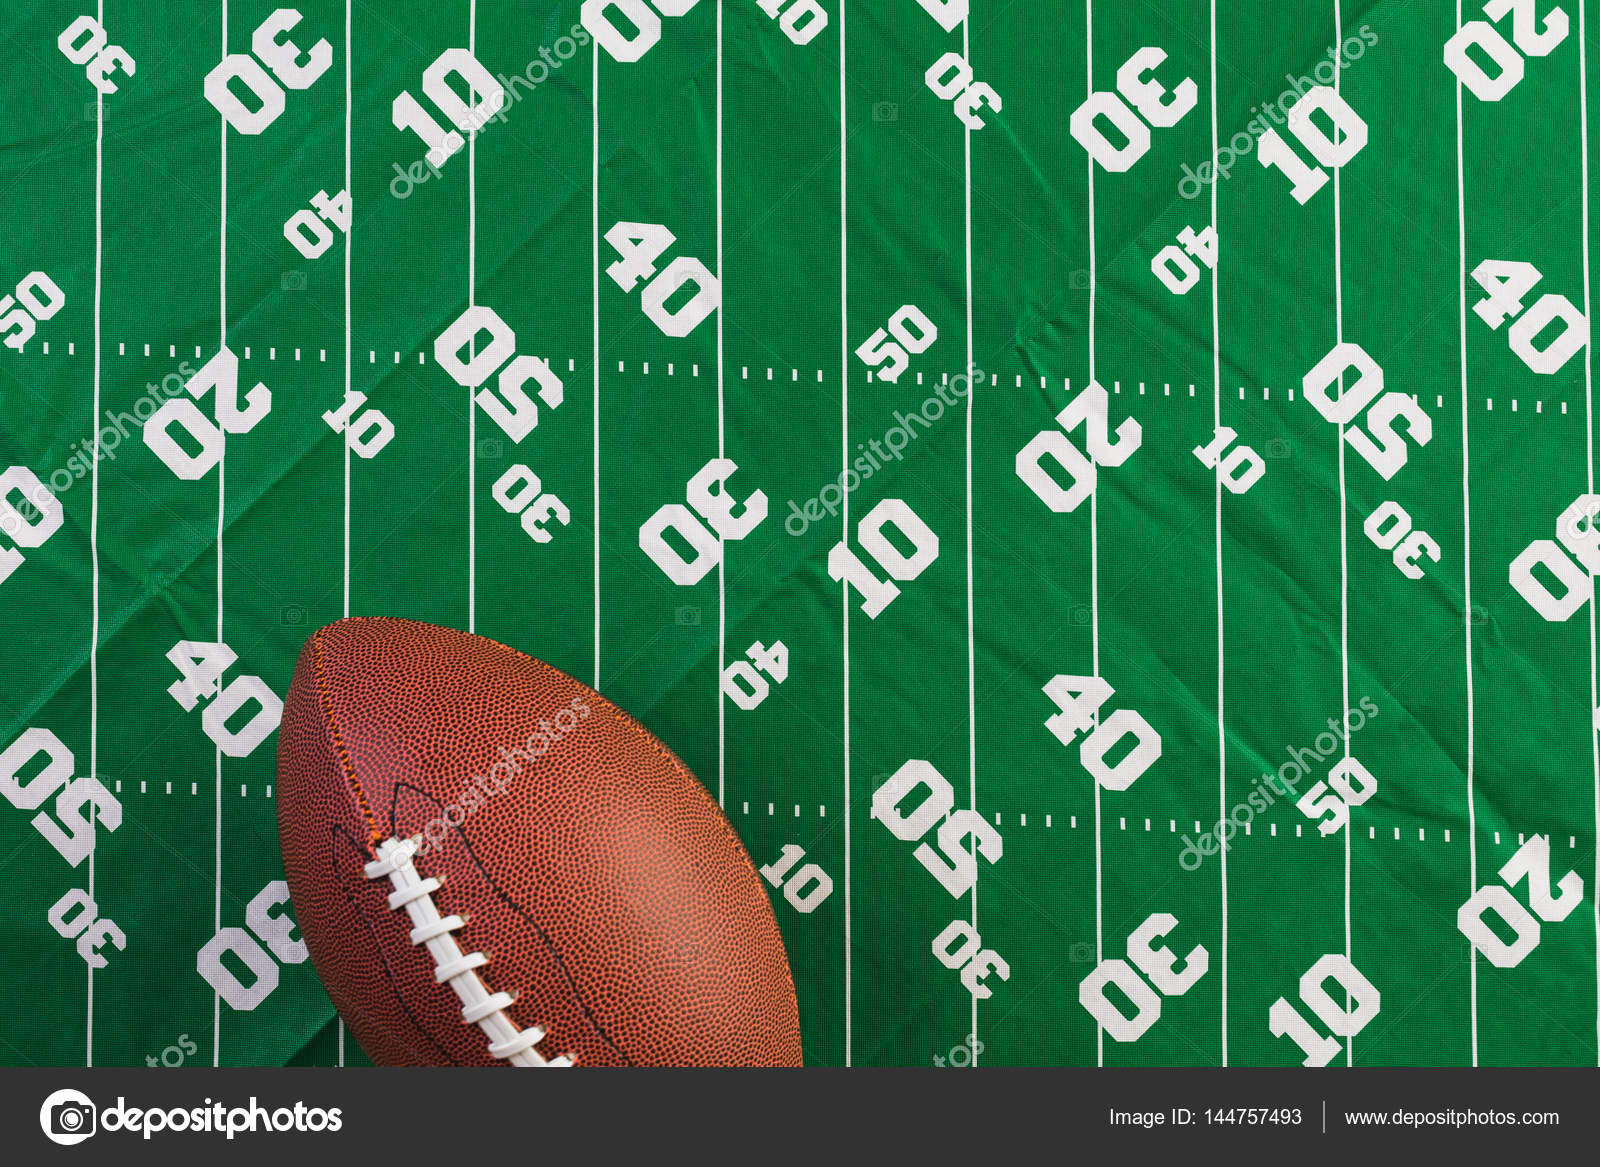 Fussball Party Hintergrund Stockfoto C Urban Light 144757493